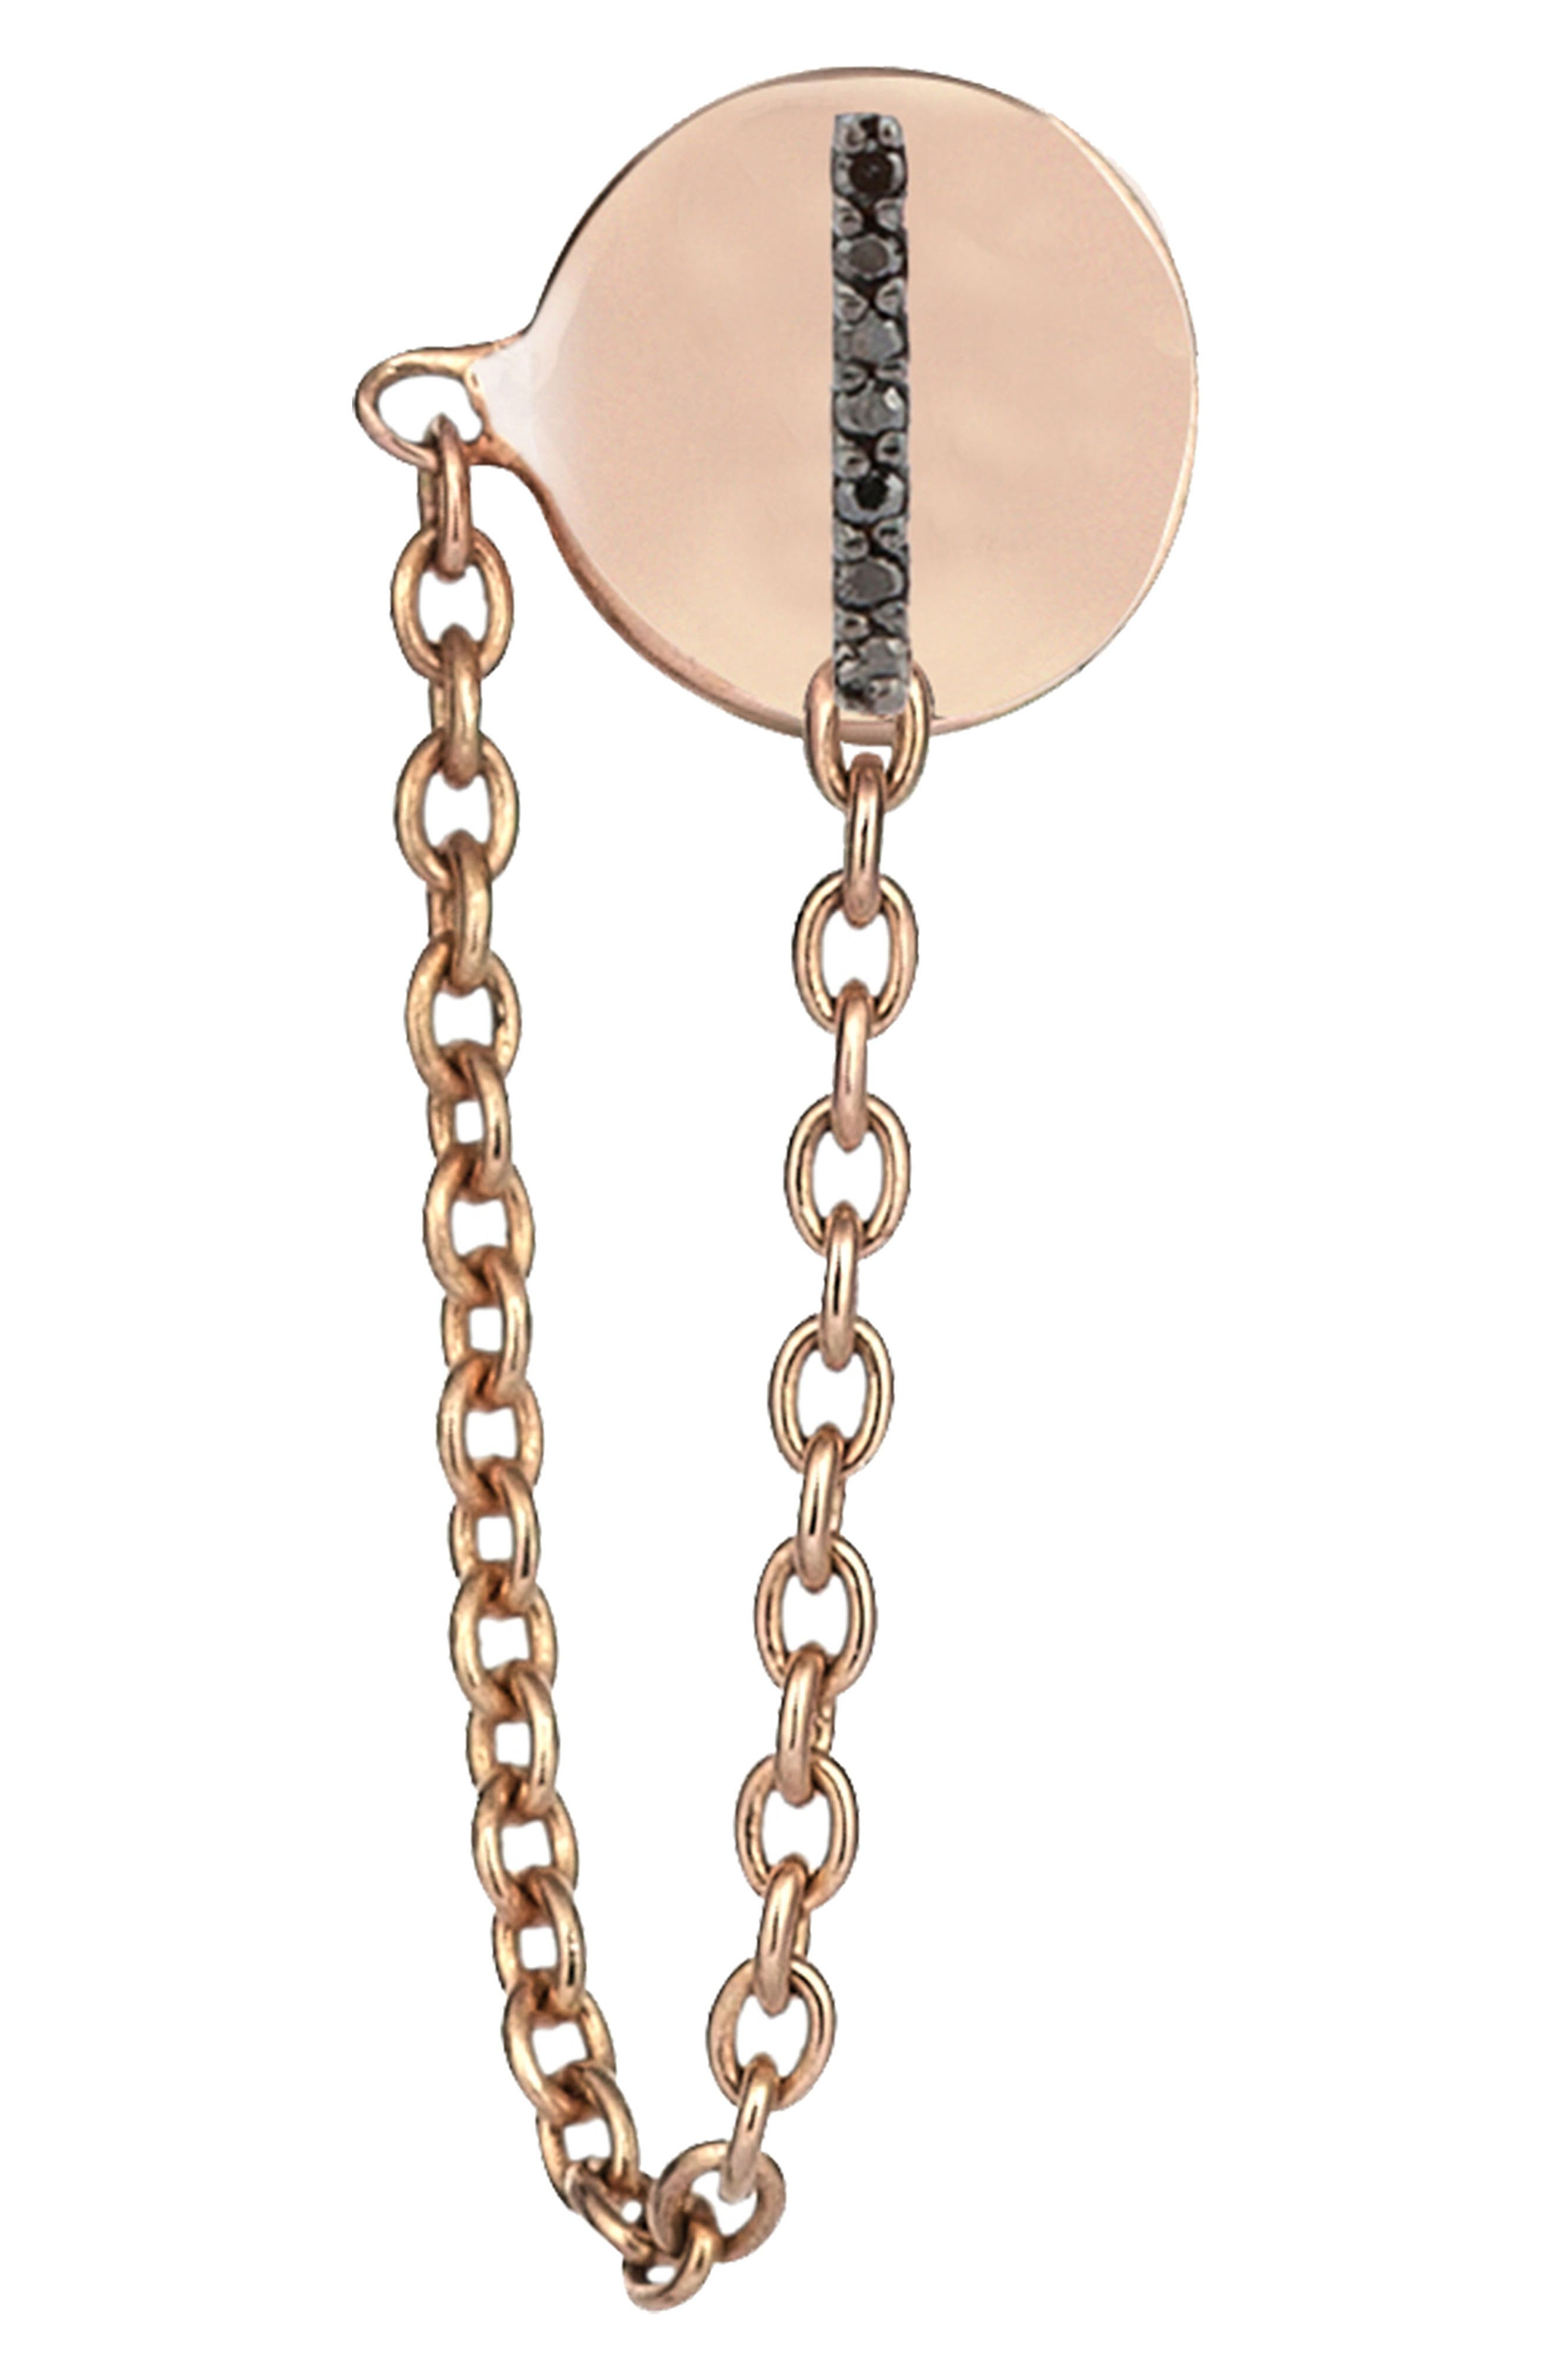 Black Diamond Stud Chain Earring,                             Main thumbnail 1, color,                             ROSE GOLD